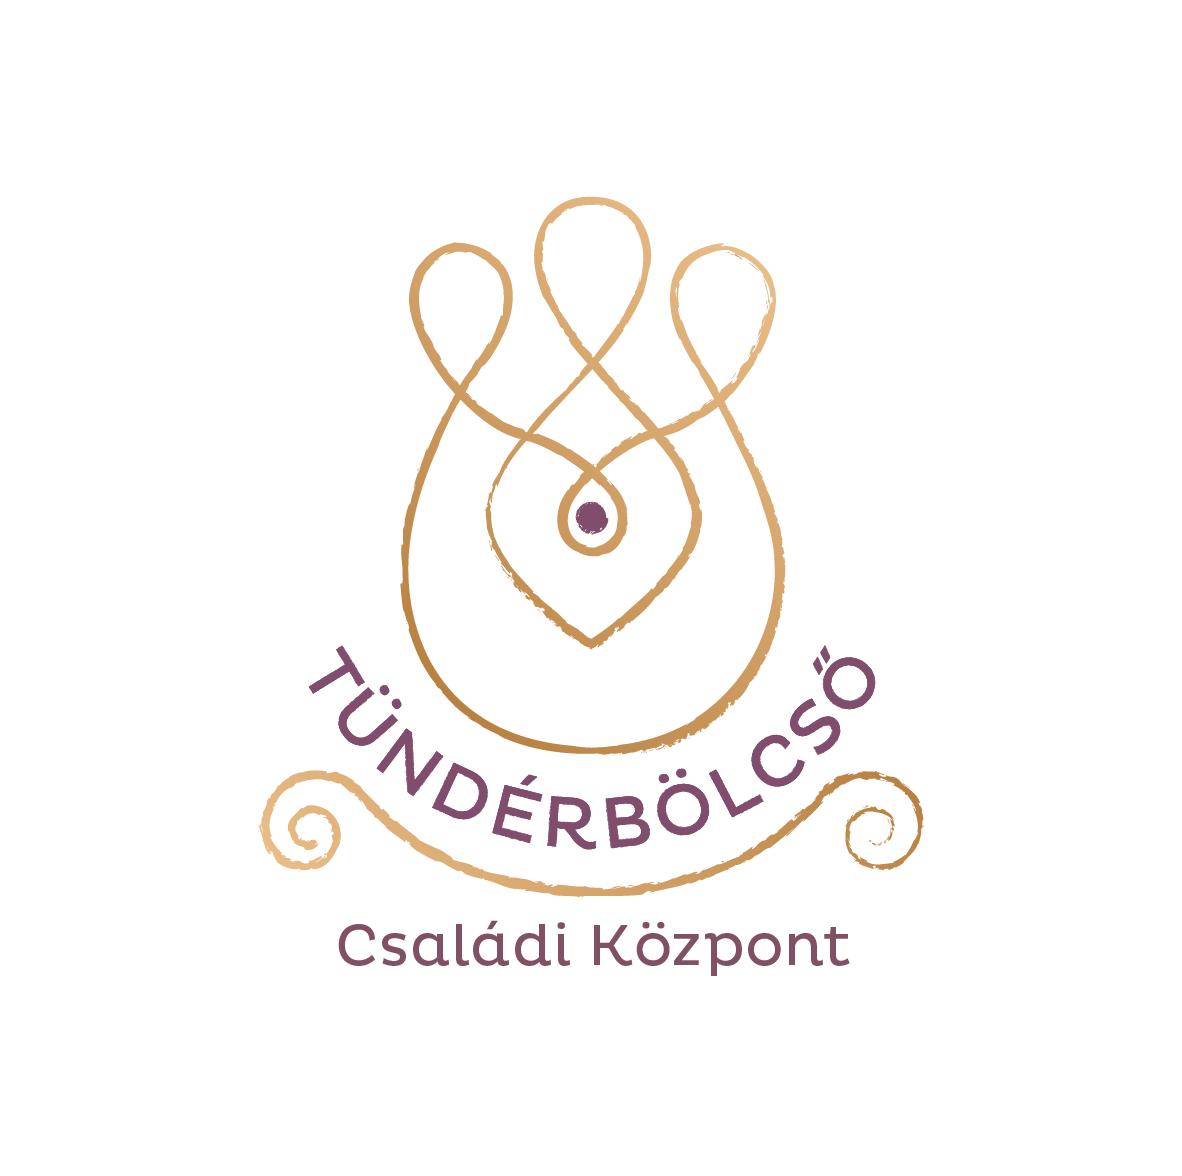 TunderBolcso-11